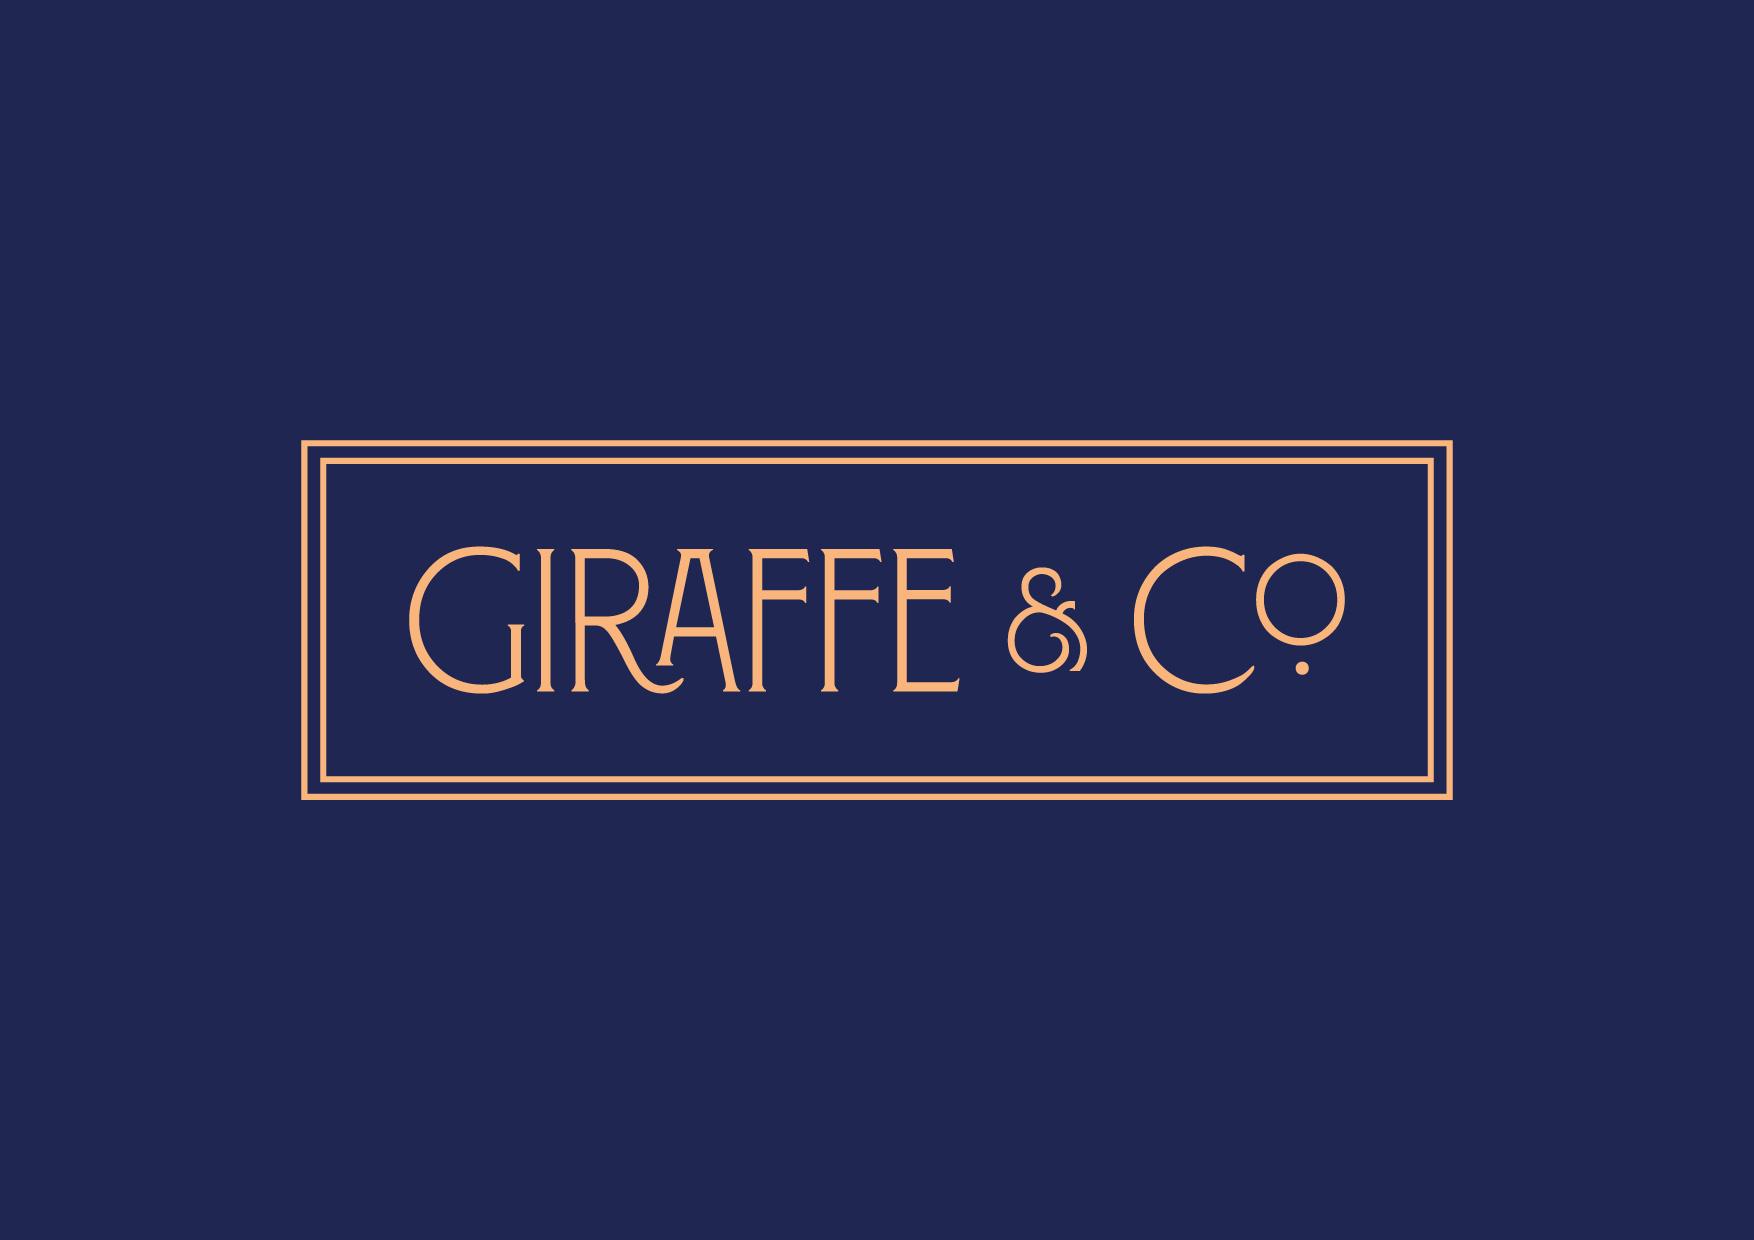 giraffeco-branding-final-04-copy